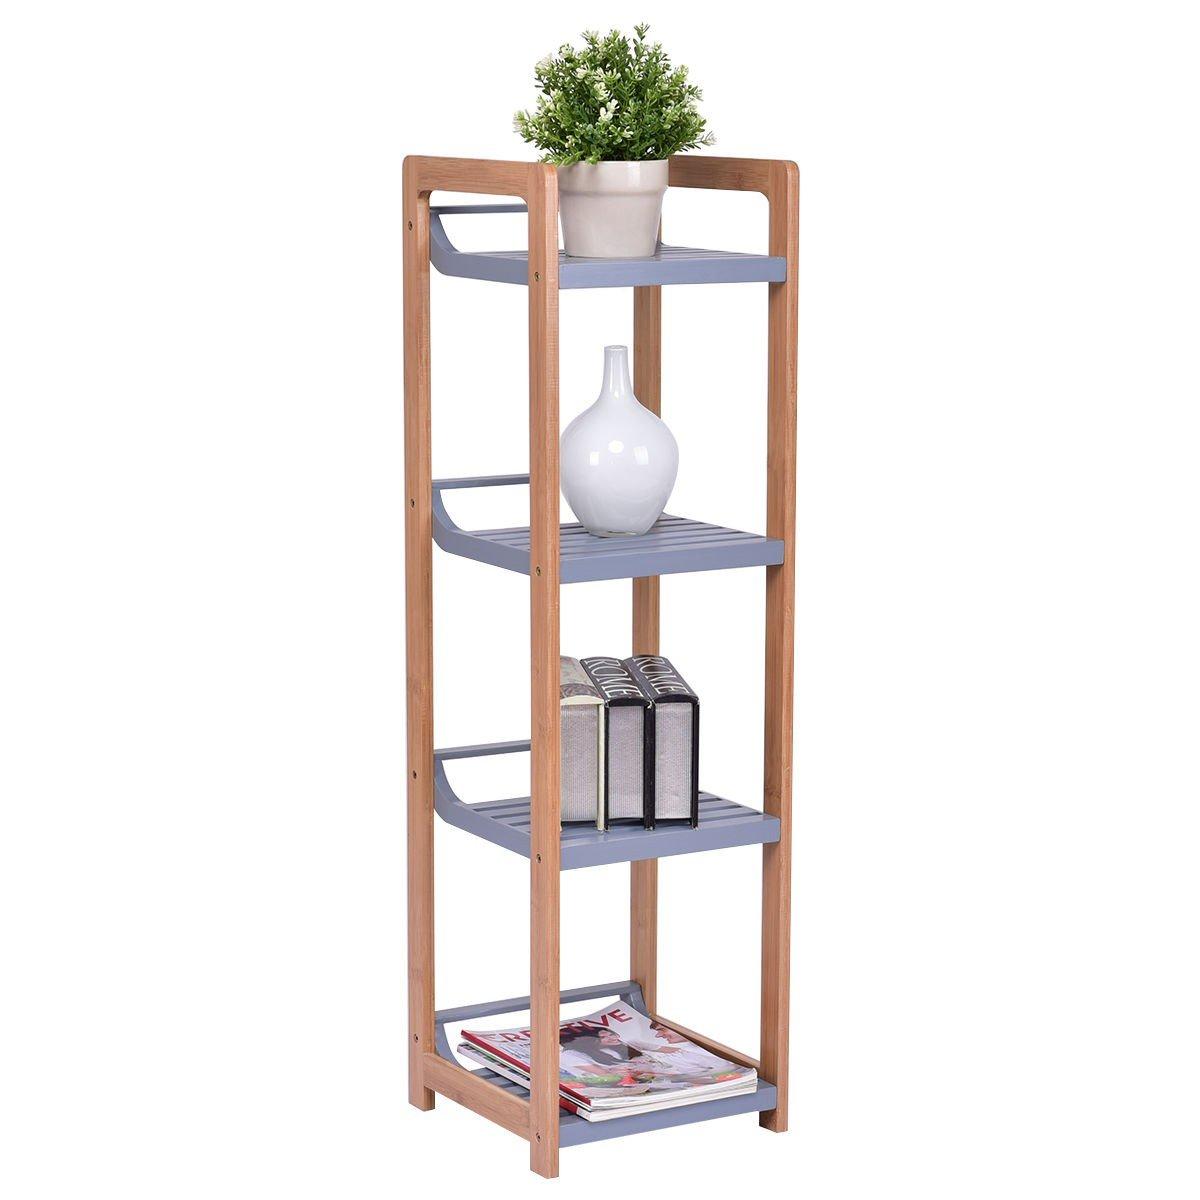 MyEasyShopping Storage Tower Stand Rack Dvd Organizer Cd Shelf Media Multimedia Holder Cabinet Shelves Black Movie Games Ray New Tier